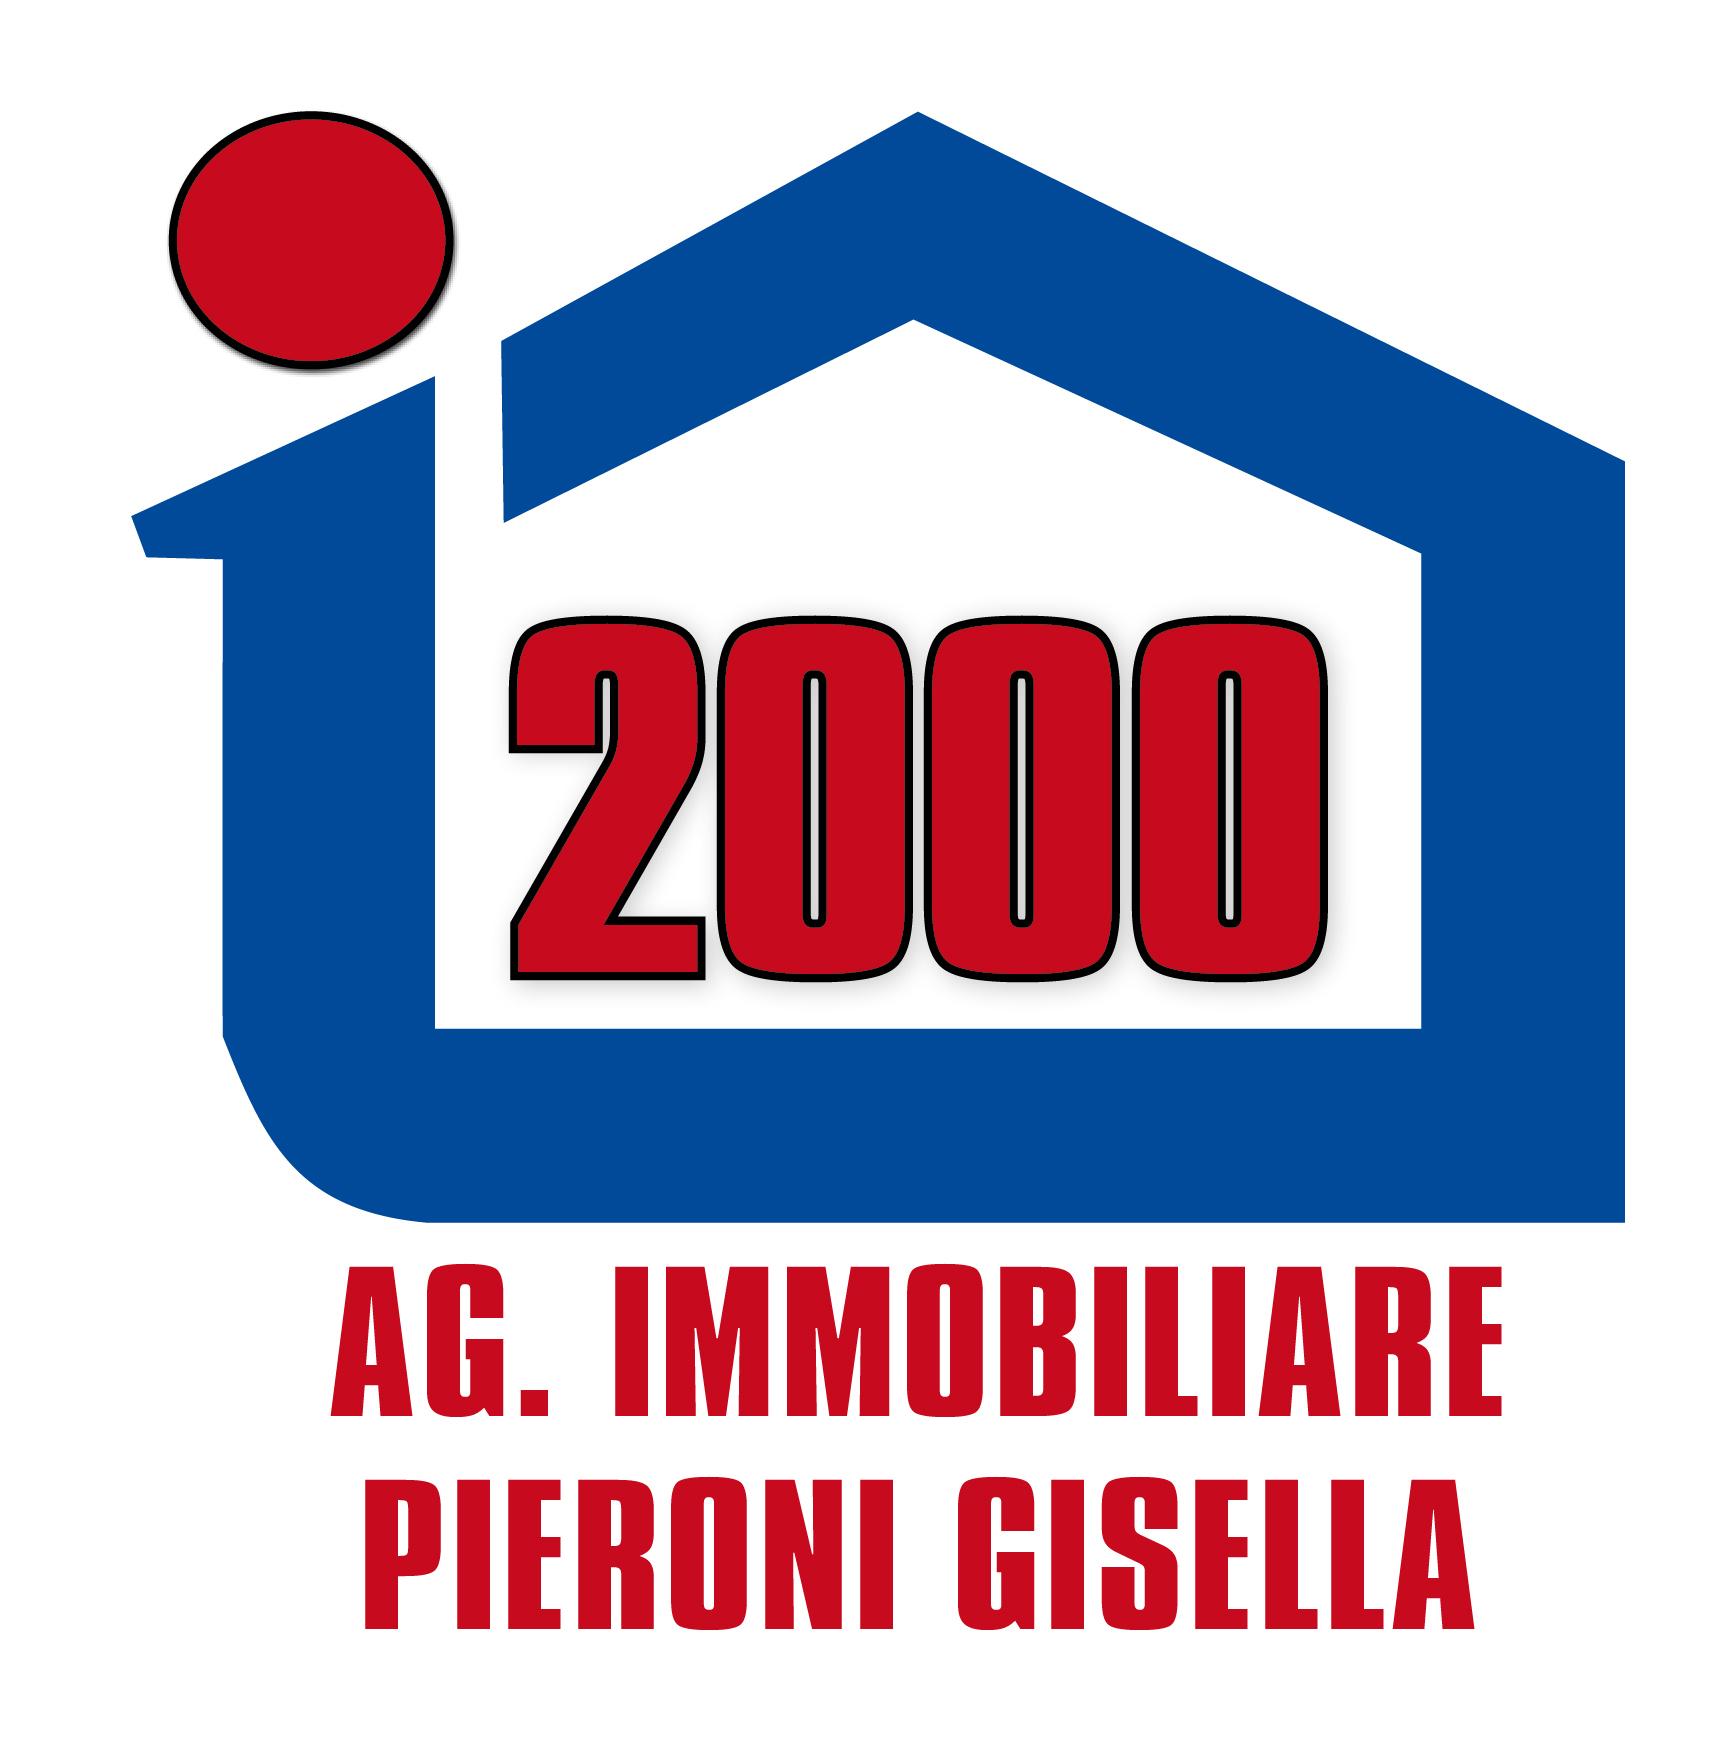 Pieroni Gisella